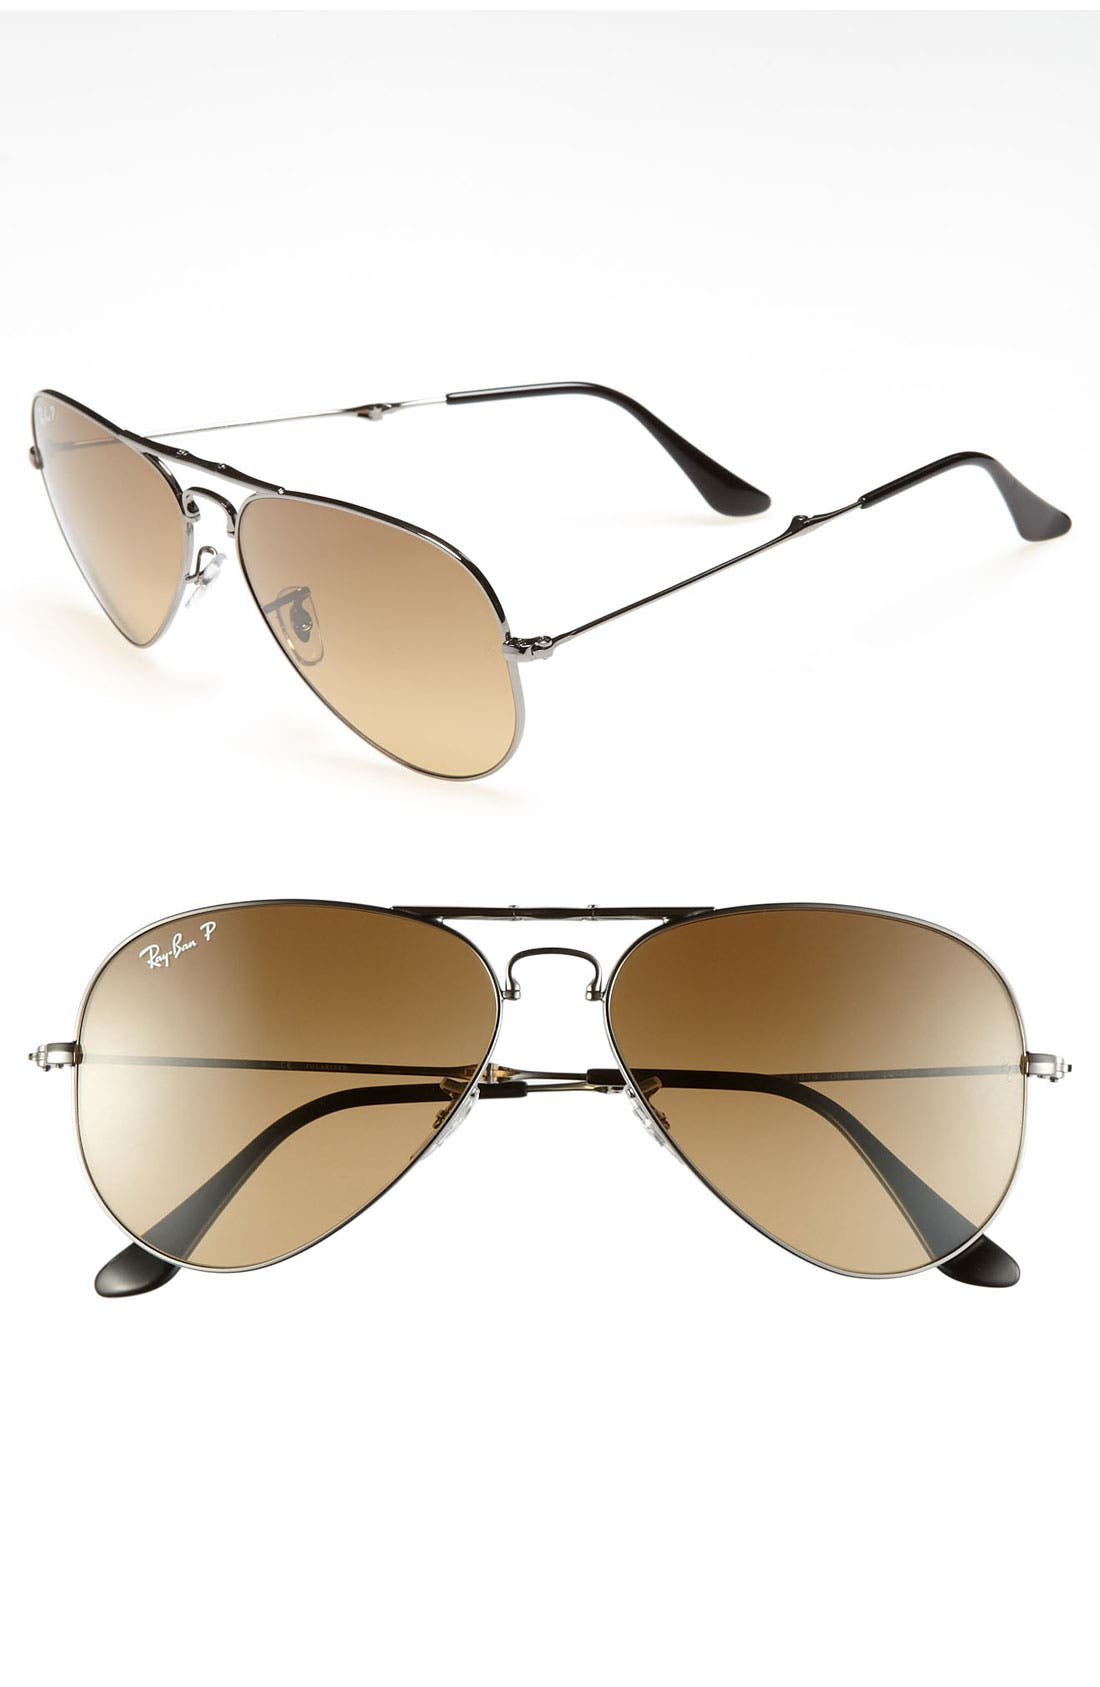 Main Image - Ray-Ban 58mm Polarized Folding Aviator Sunglasses